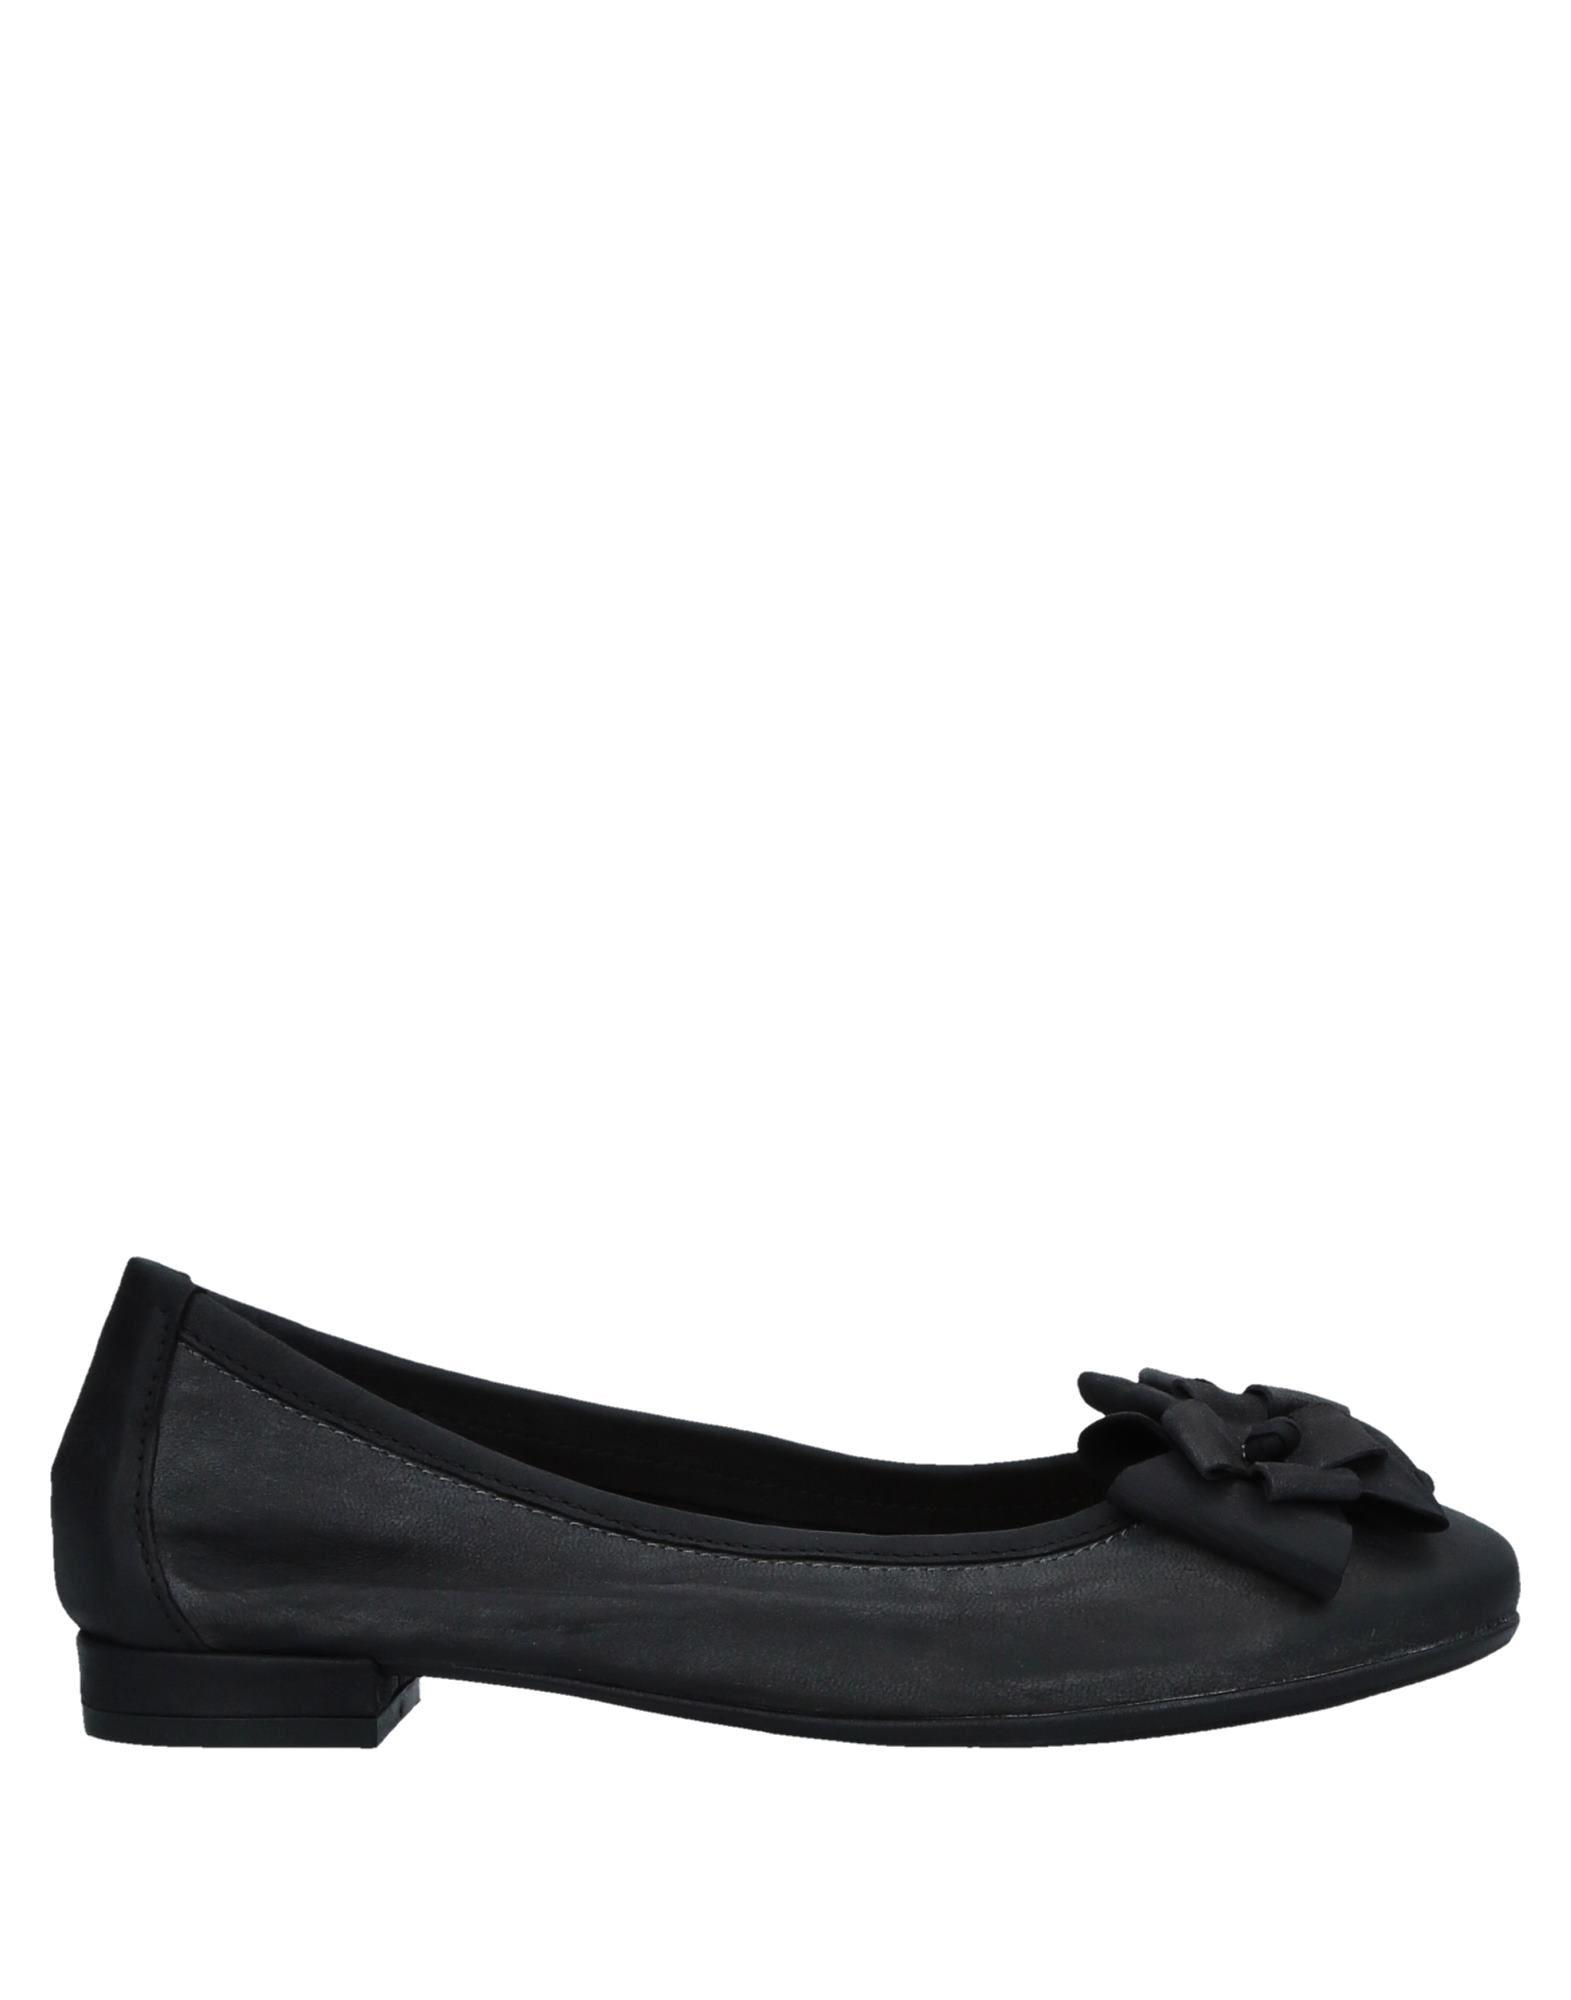 Clocharme Ballerinas Gute Damen  11527785XT Gute Ballerinas Qualität beliebte Schuhe 9ef110